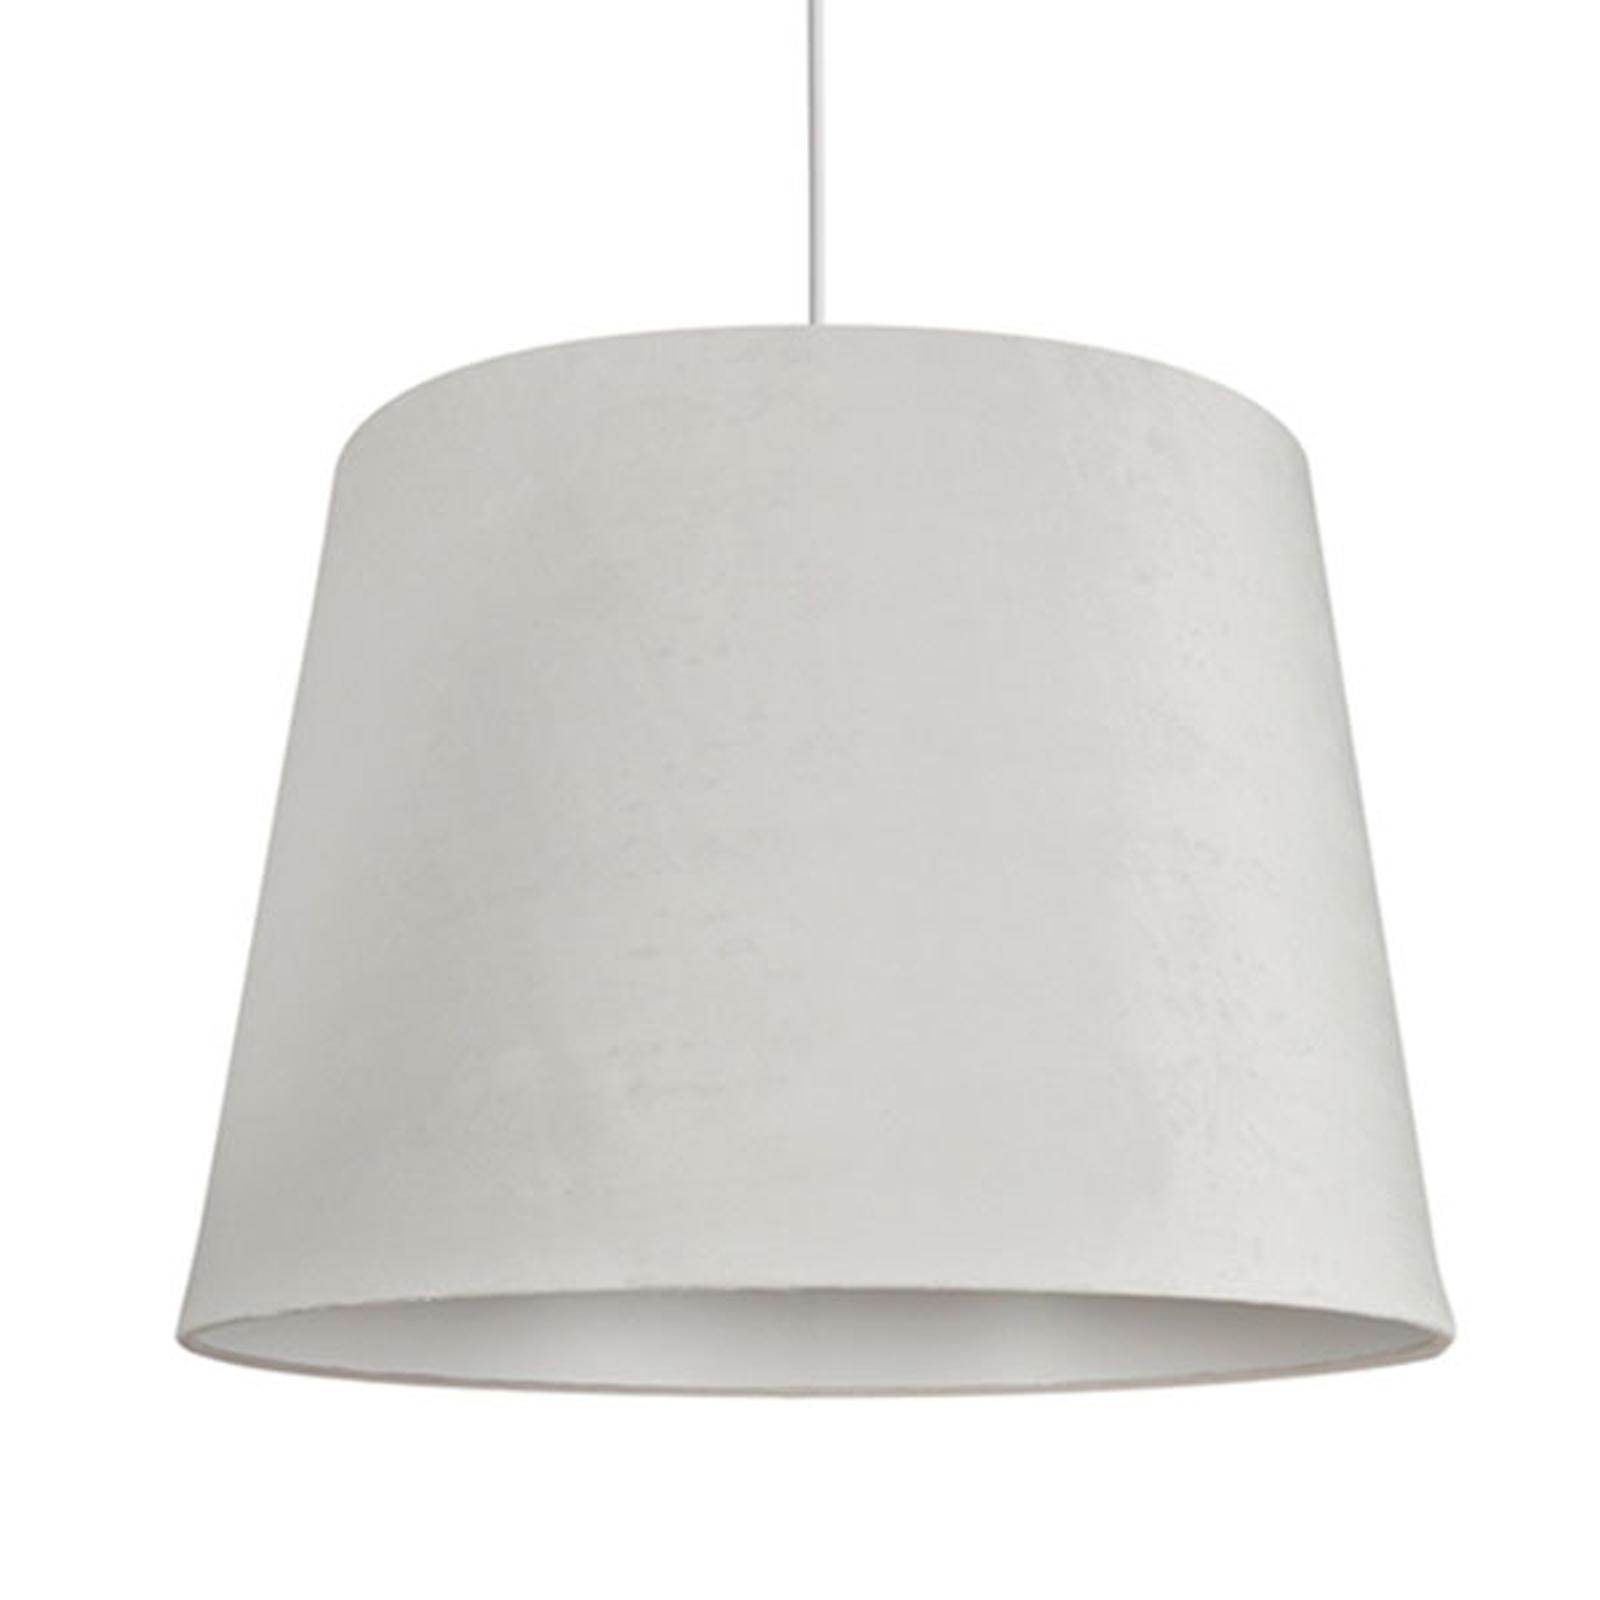 Hengelampe Cone M fløyelsskjerm, Ø 46,5 cm, hvit